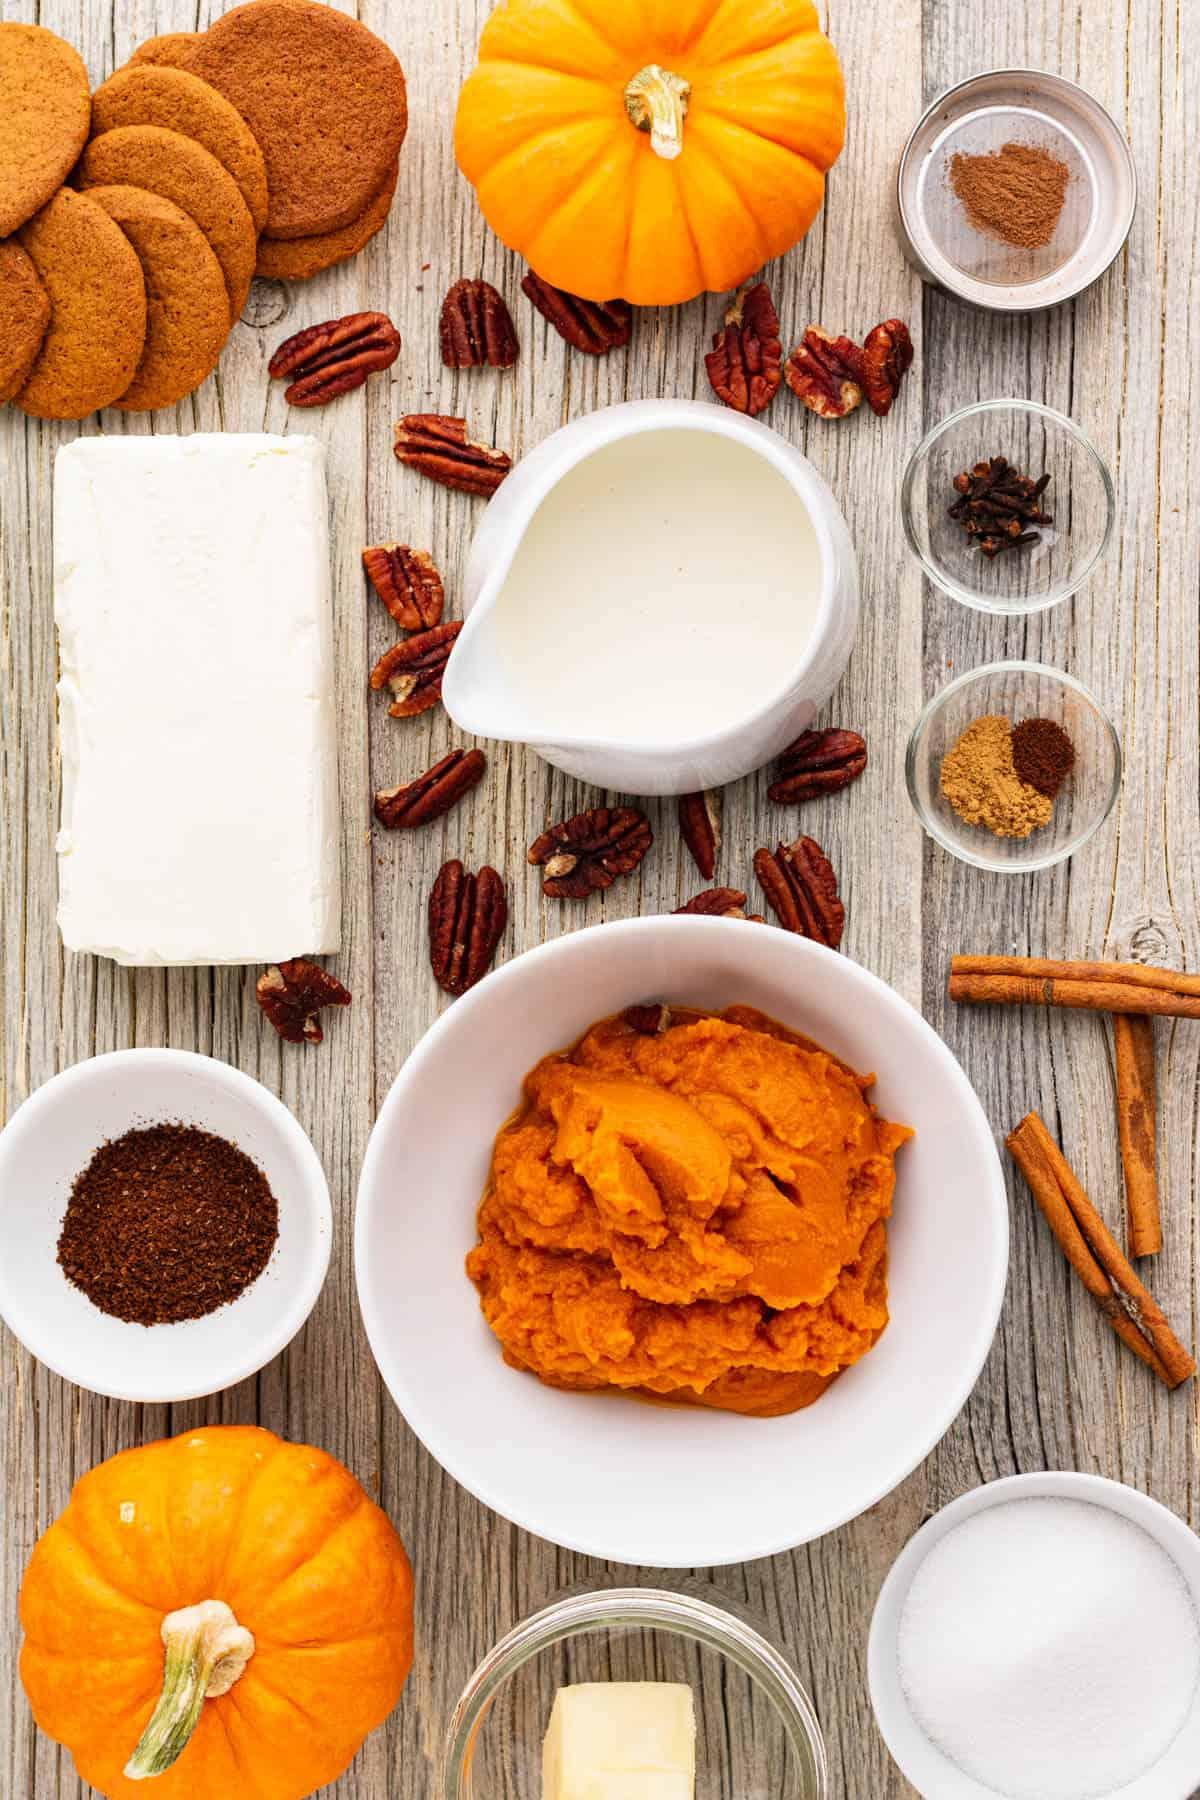 Ingredients used in making Pumpkin Delight dessert.